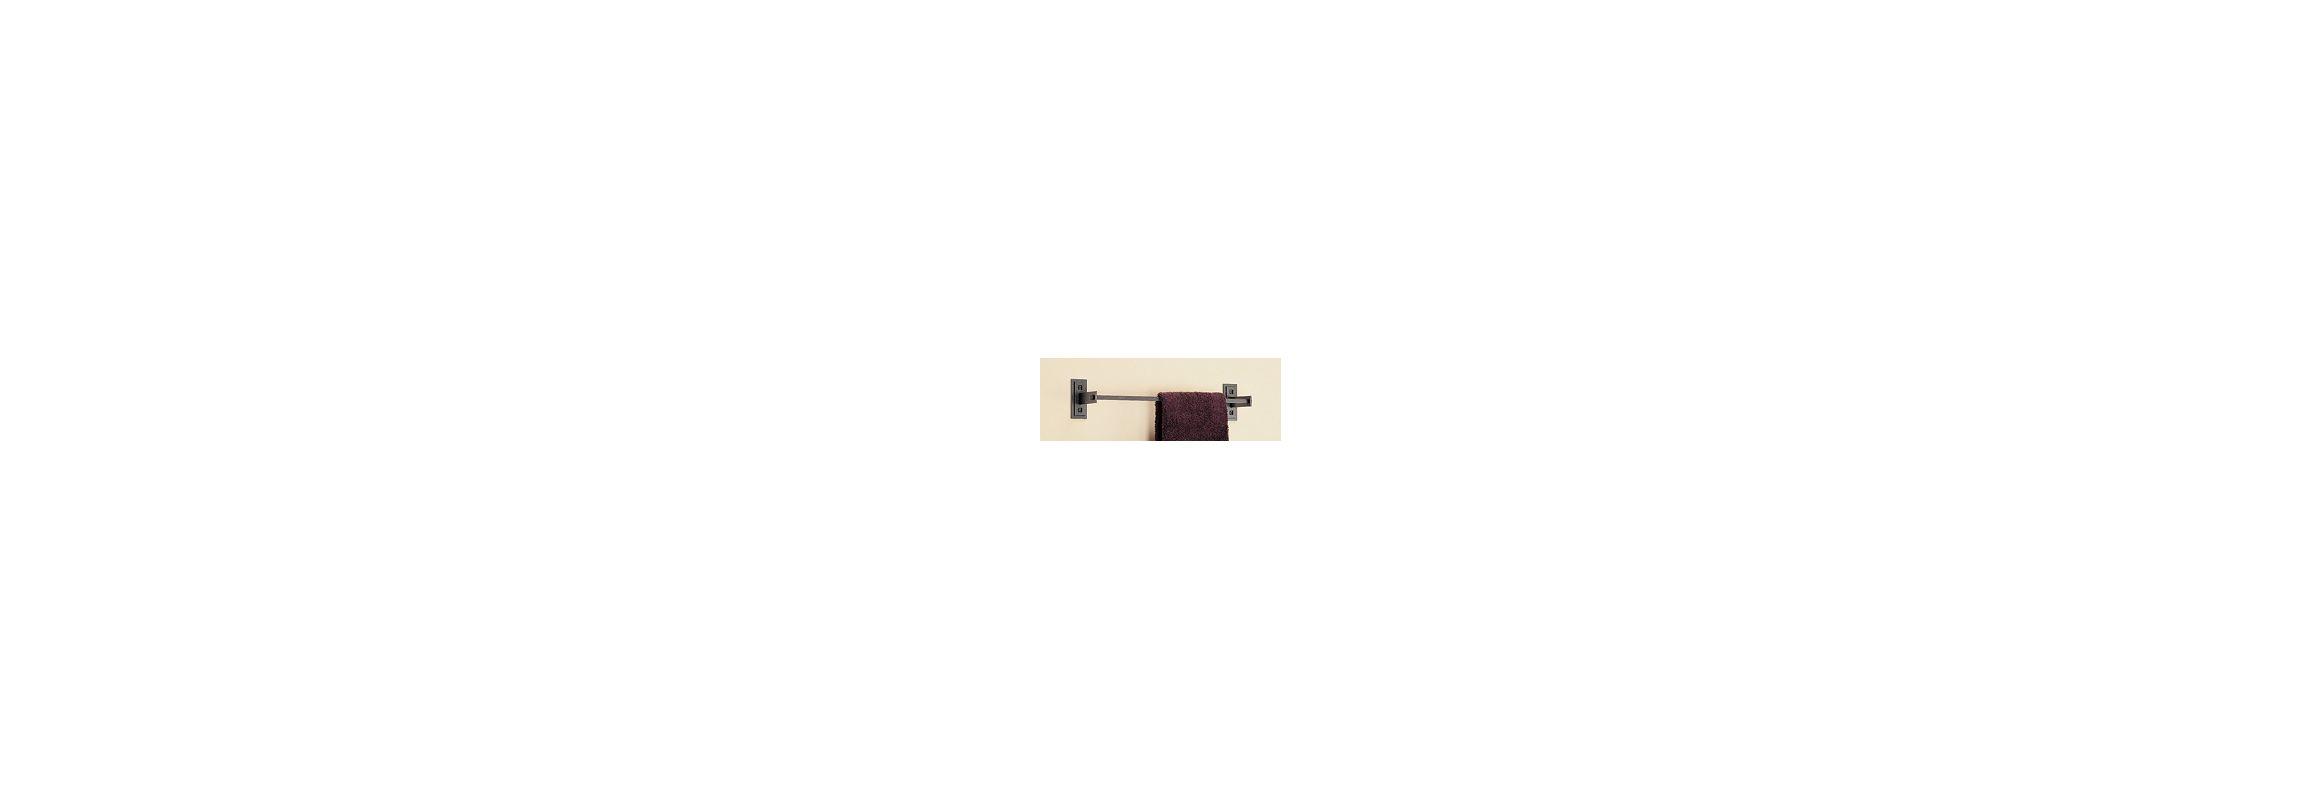 "Hubbardton Forge 842016 17.5"" Metra Towel Holder Natural Iron"